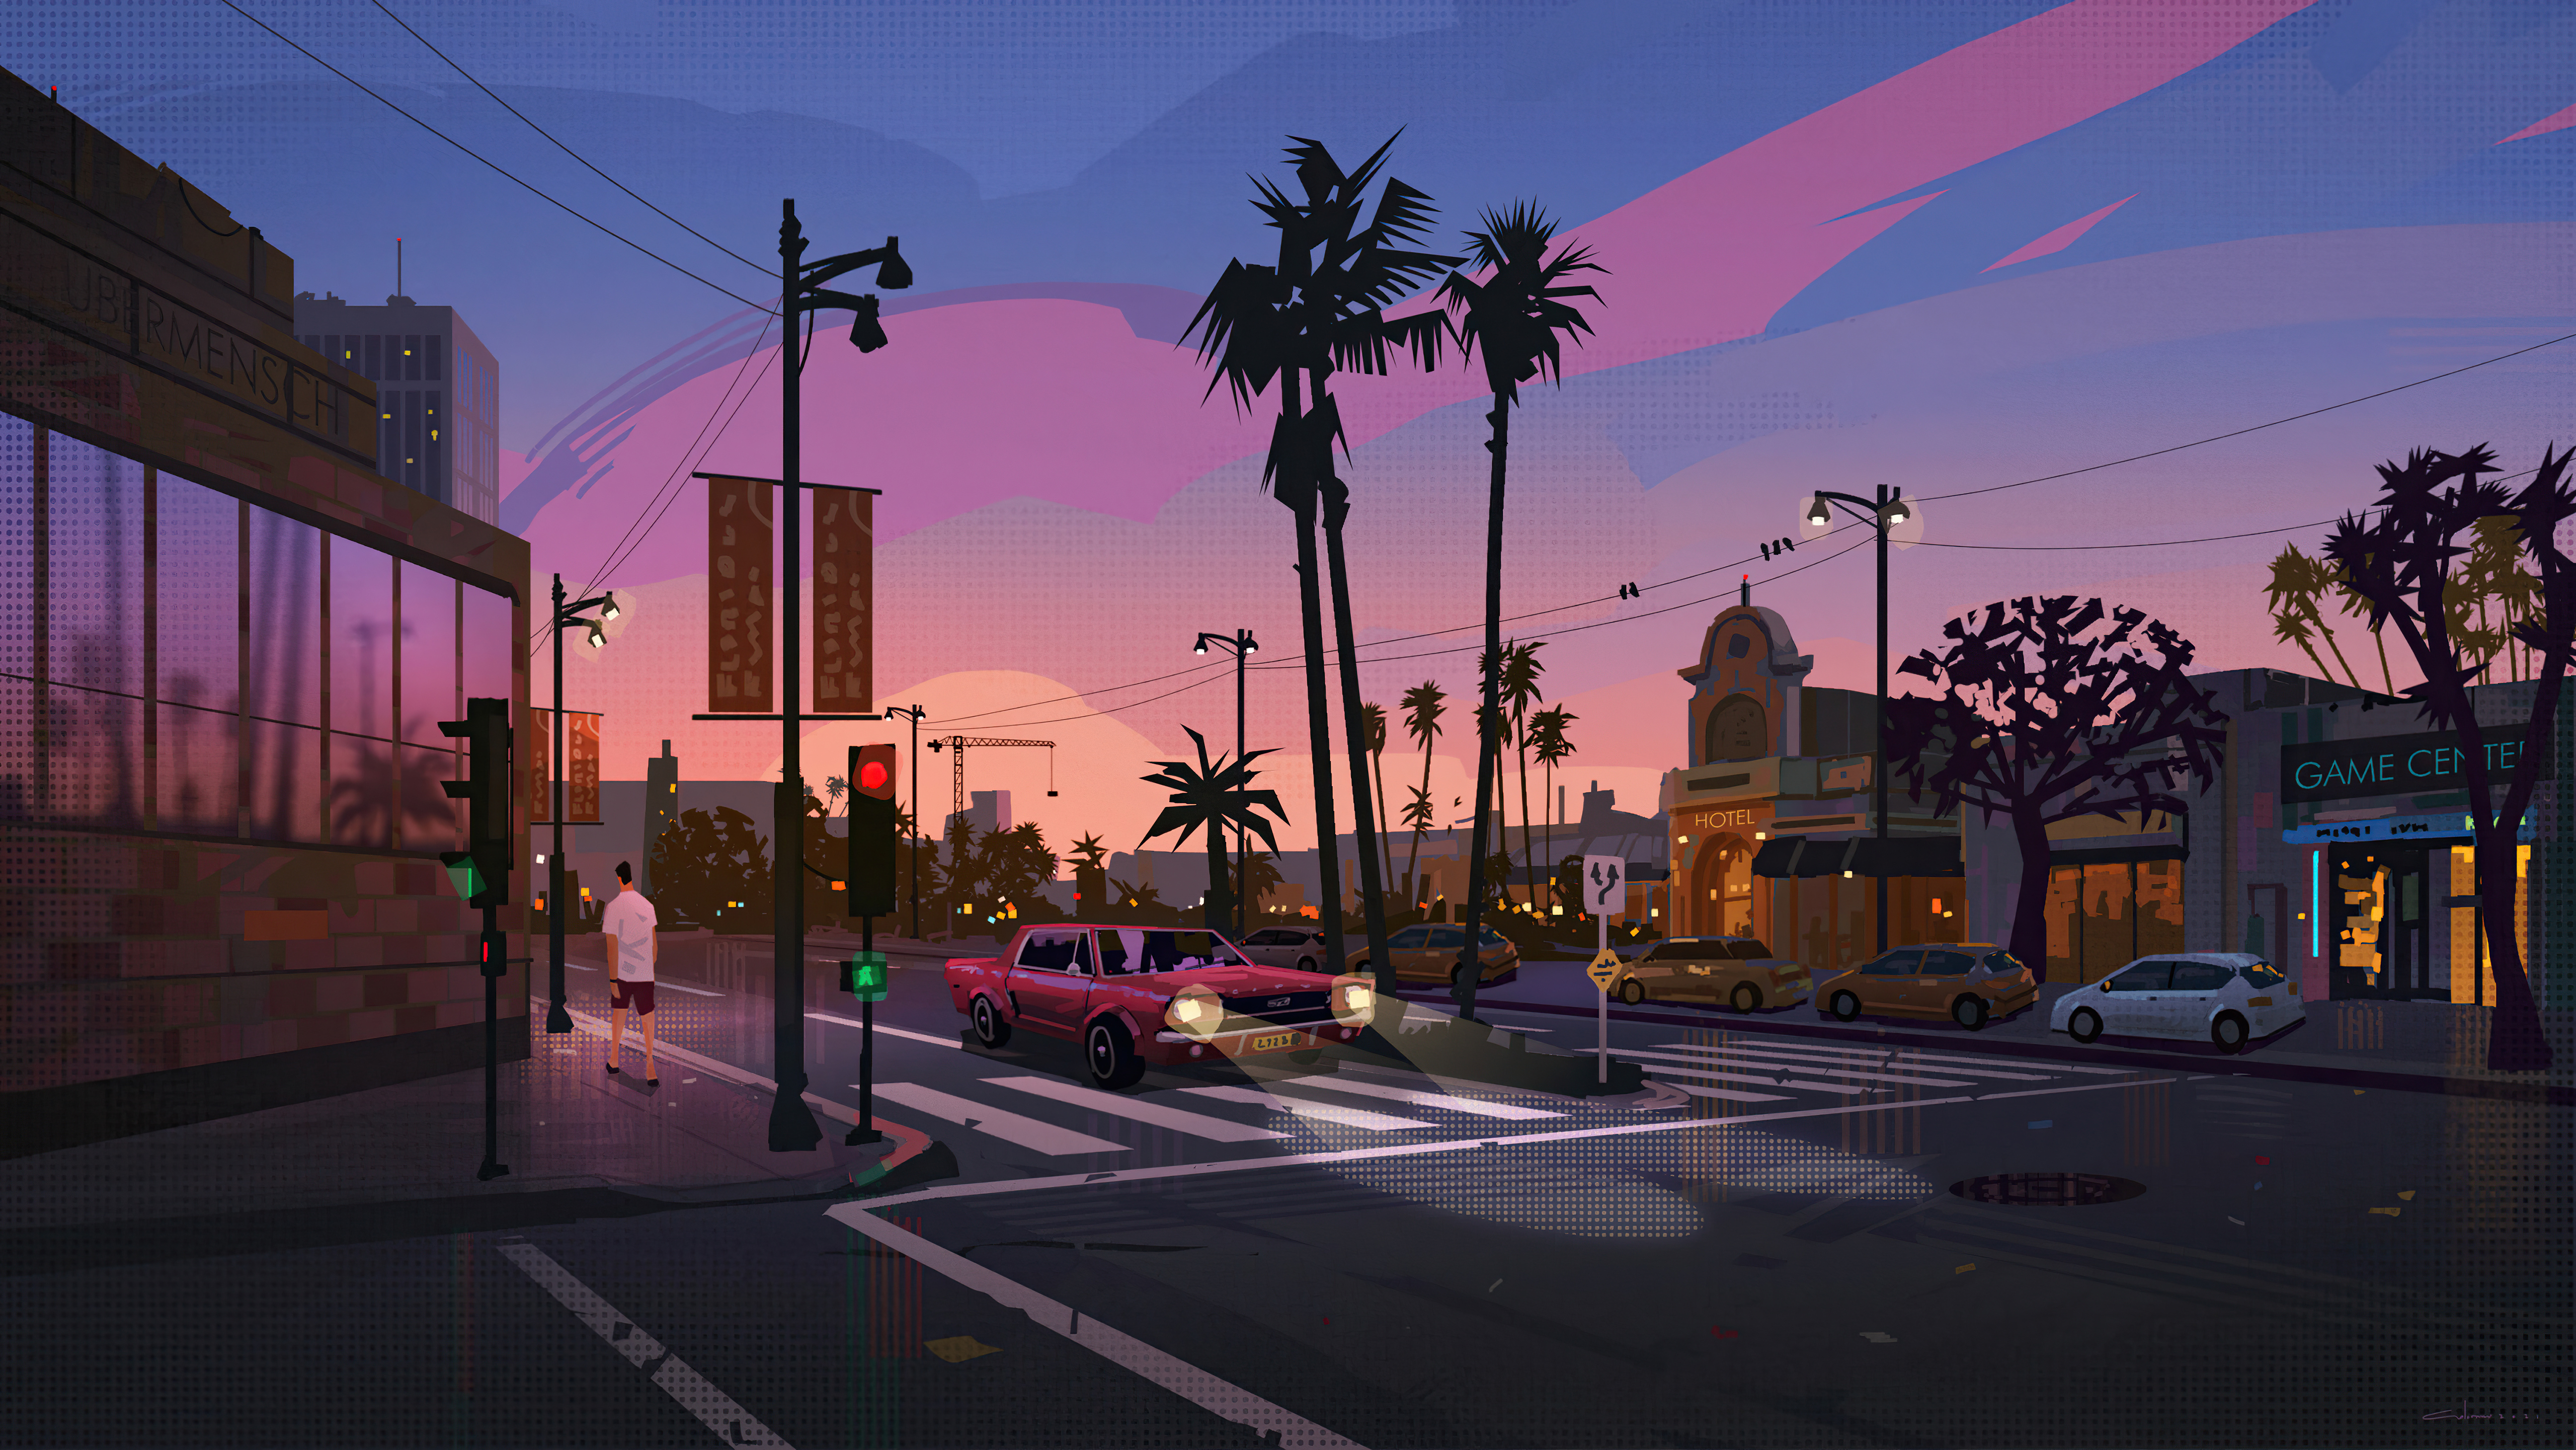 la street 4k 1618128095 - La Street 4k - La Street 4k wallpapers